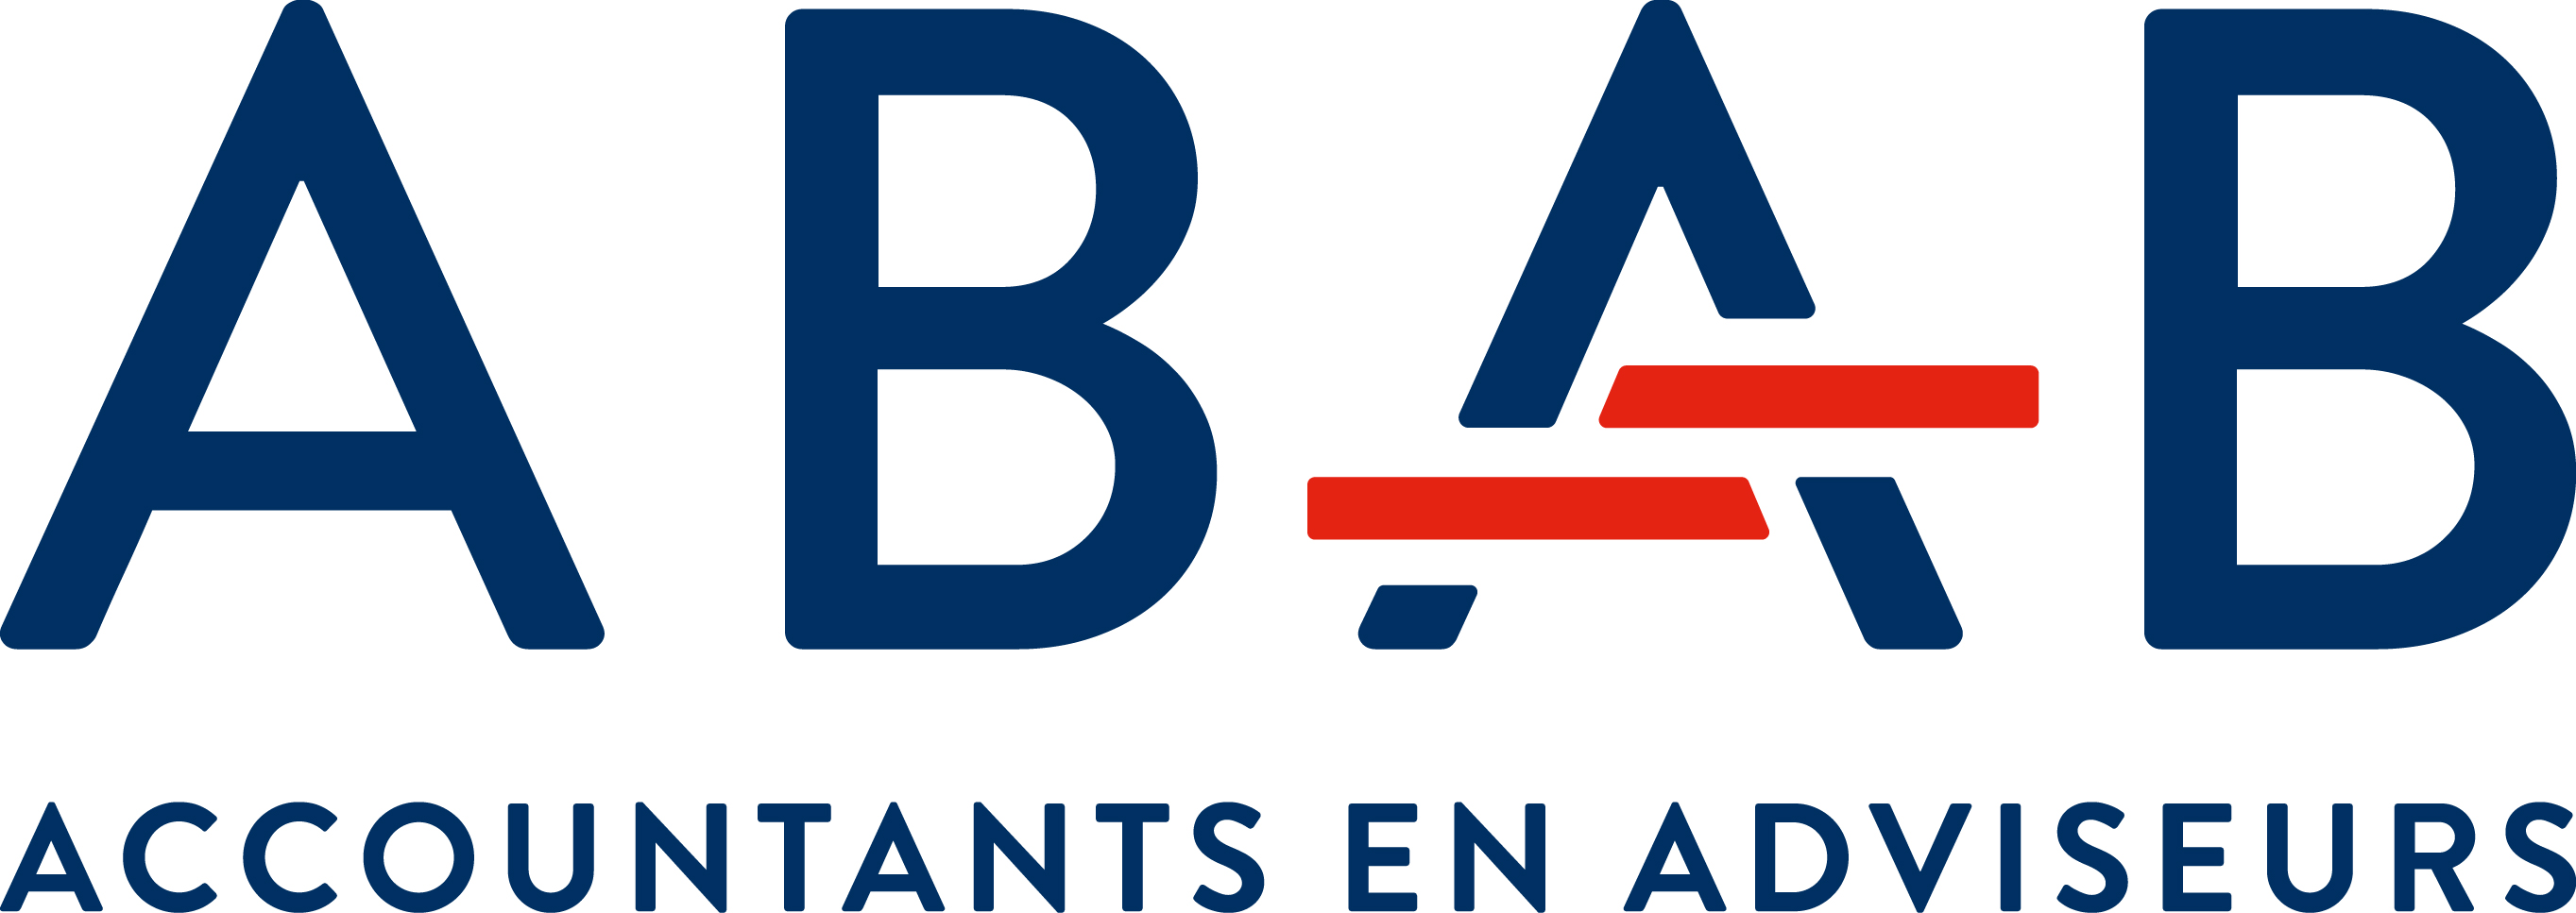 Foto van ABAB Accountants en Adviseurs (Veldhoven)